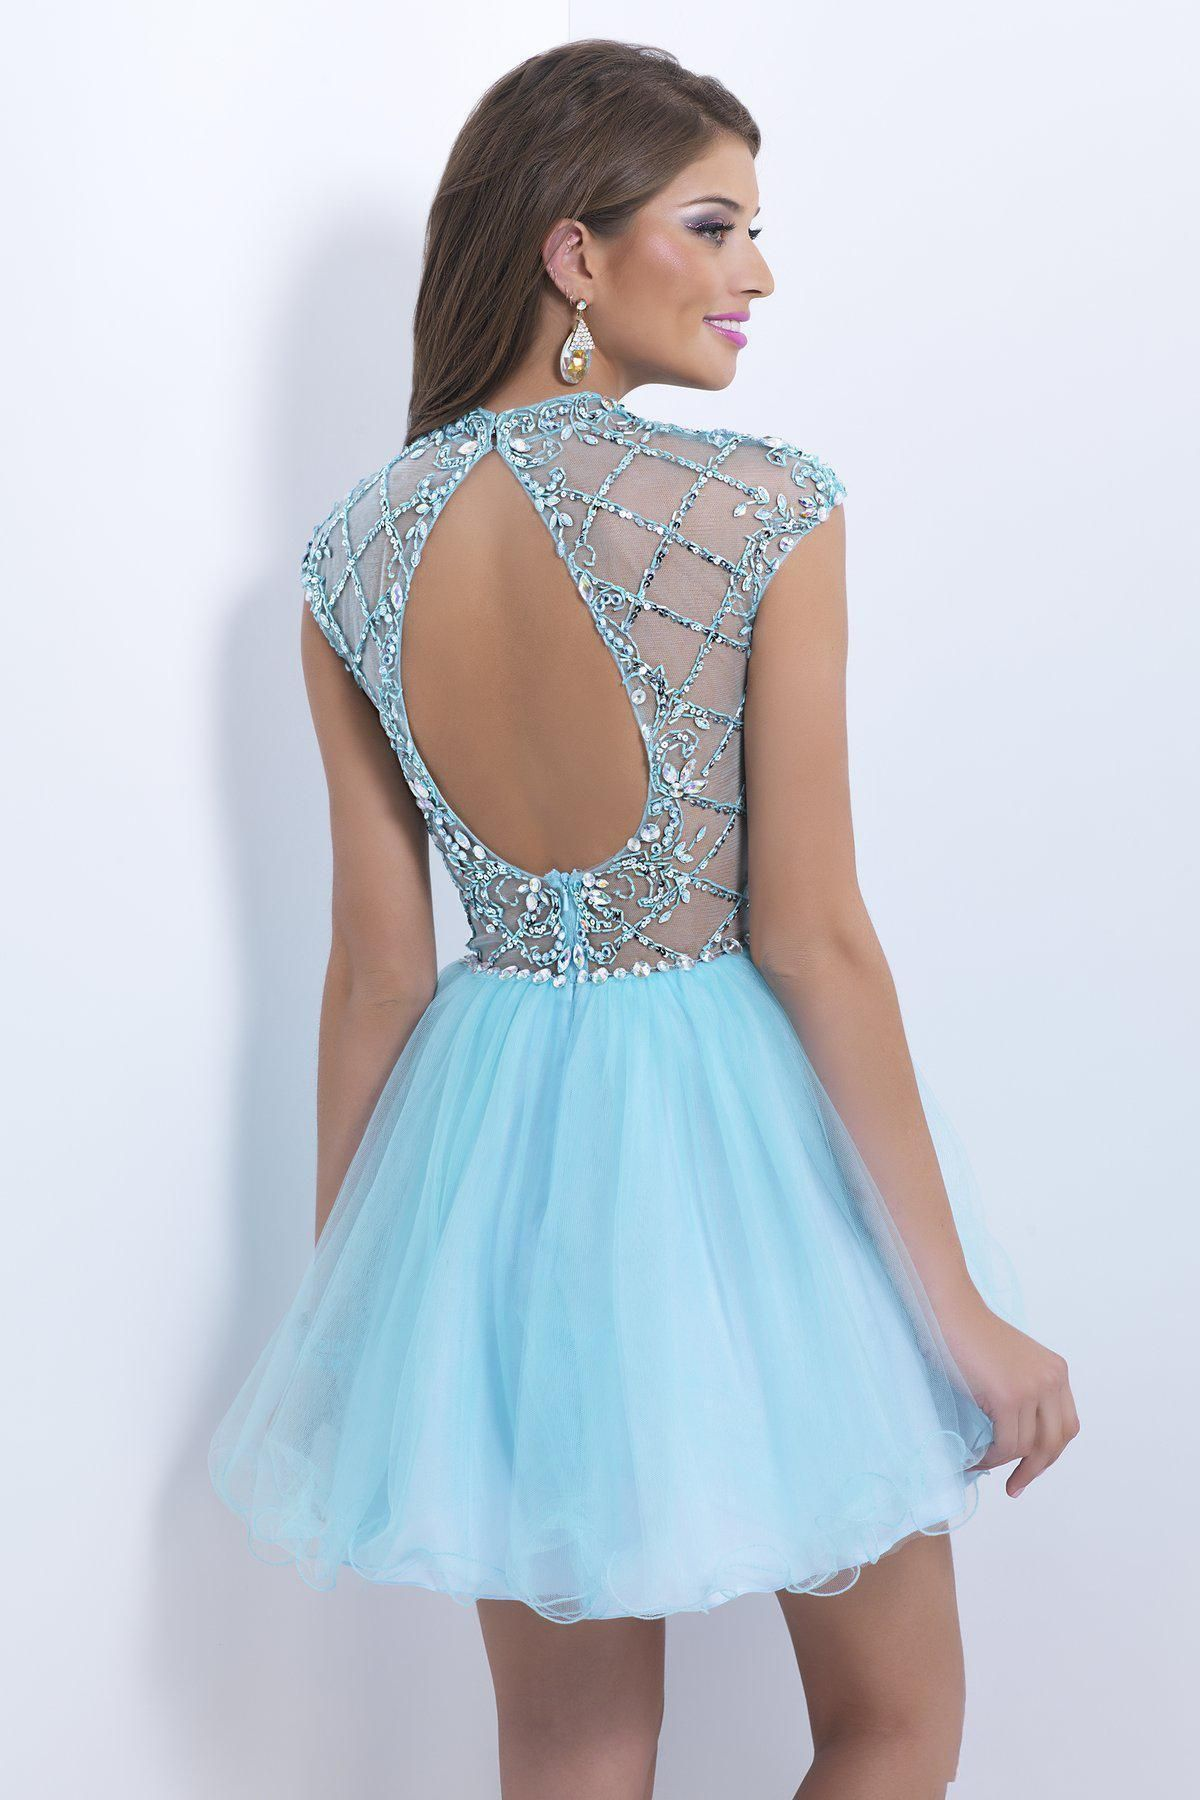 Medium Of 8th Grade Prom Dresses